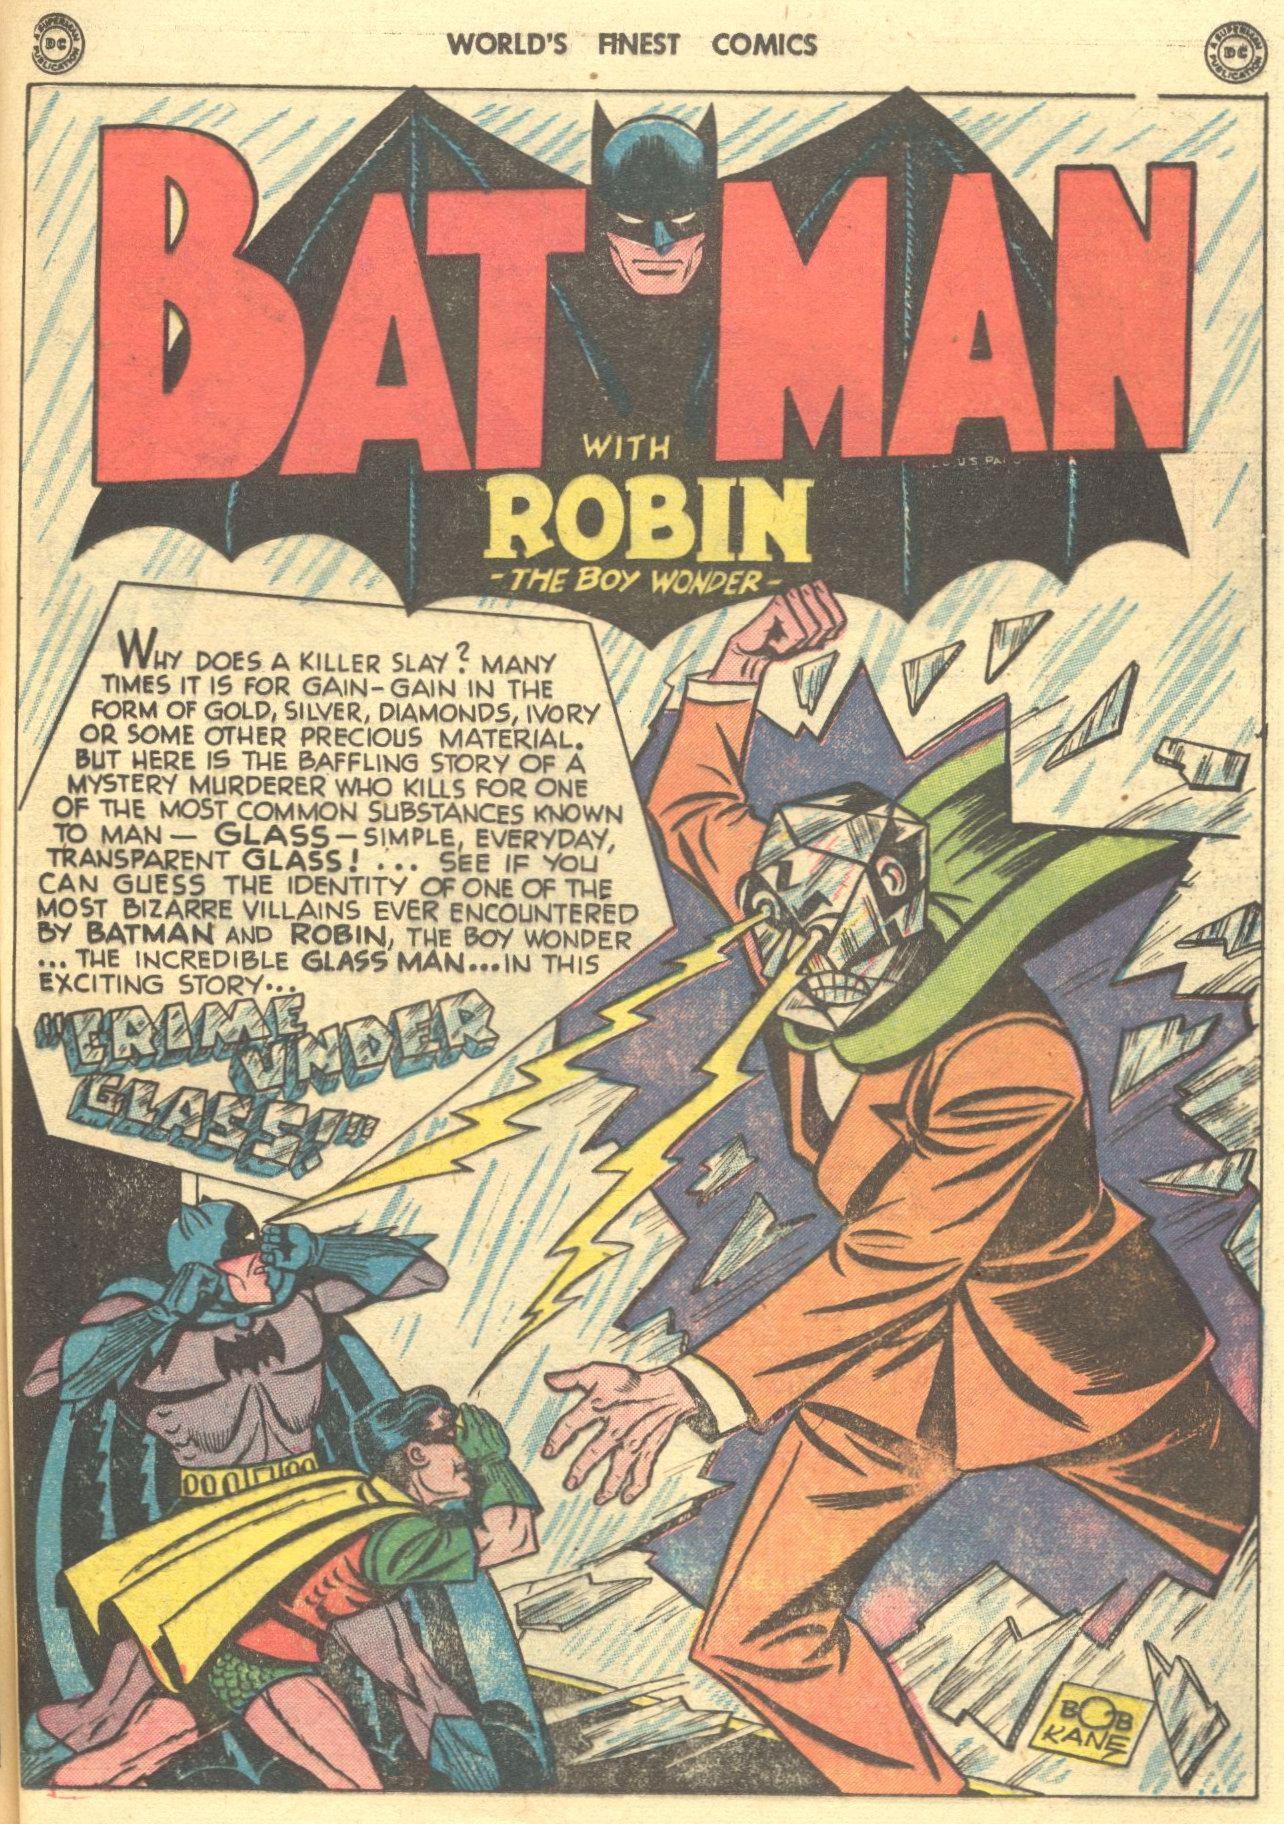 Read online World's Finest Comics comic -  Issue #28 - 60